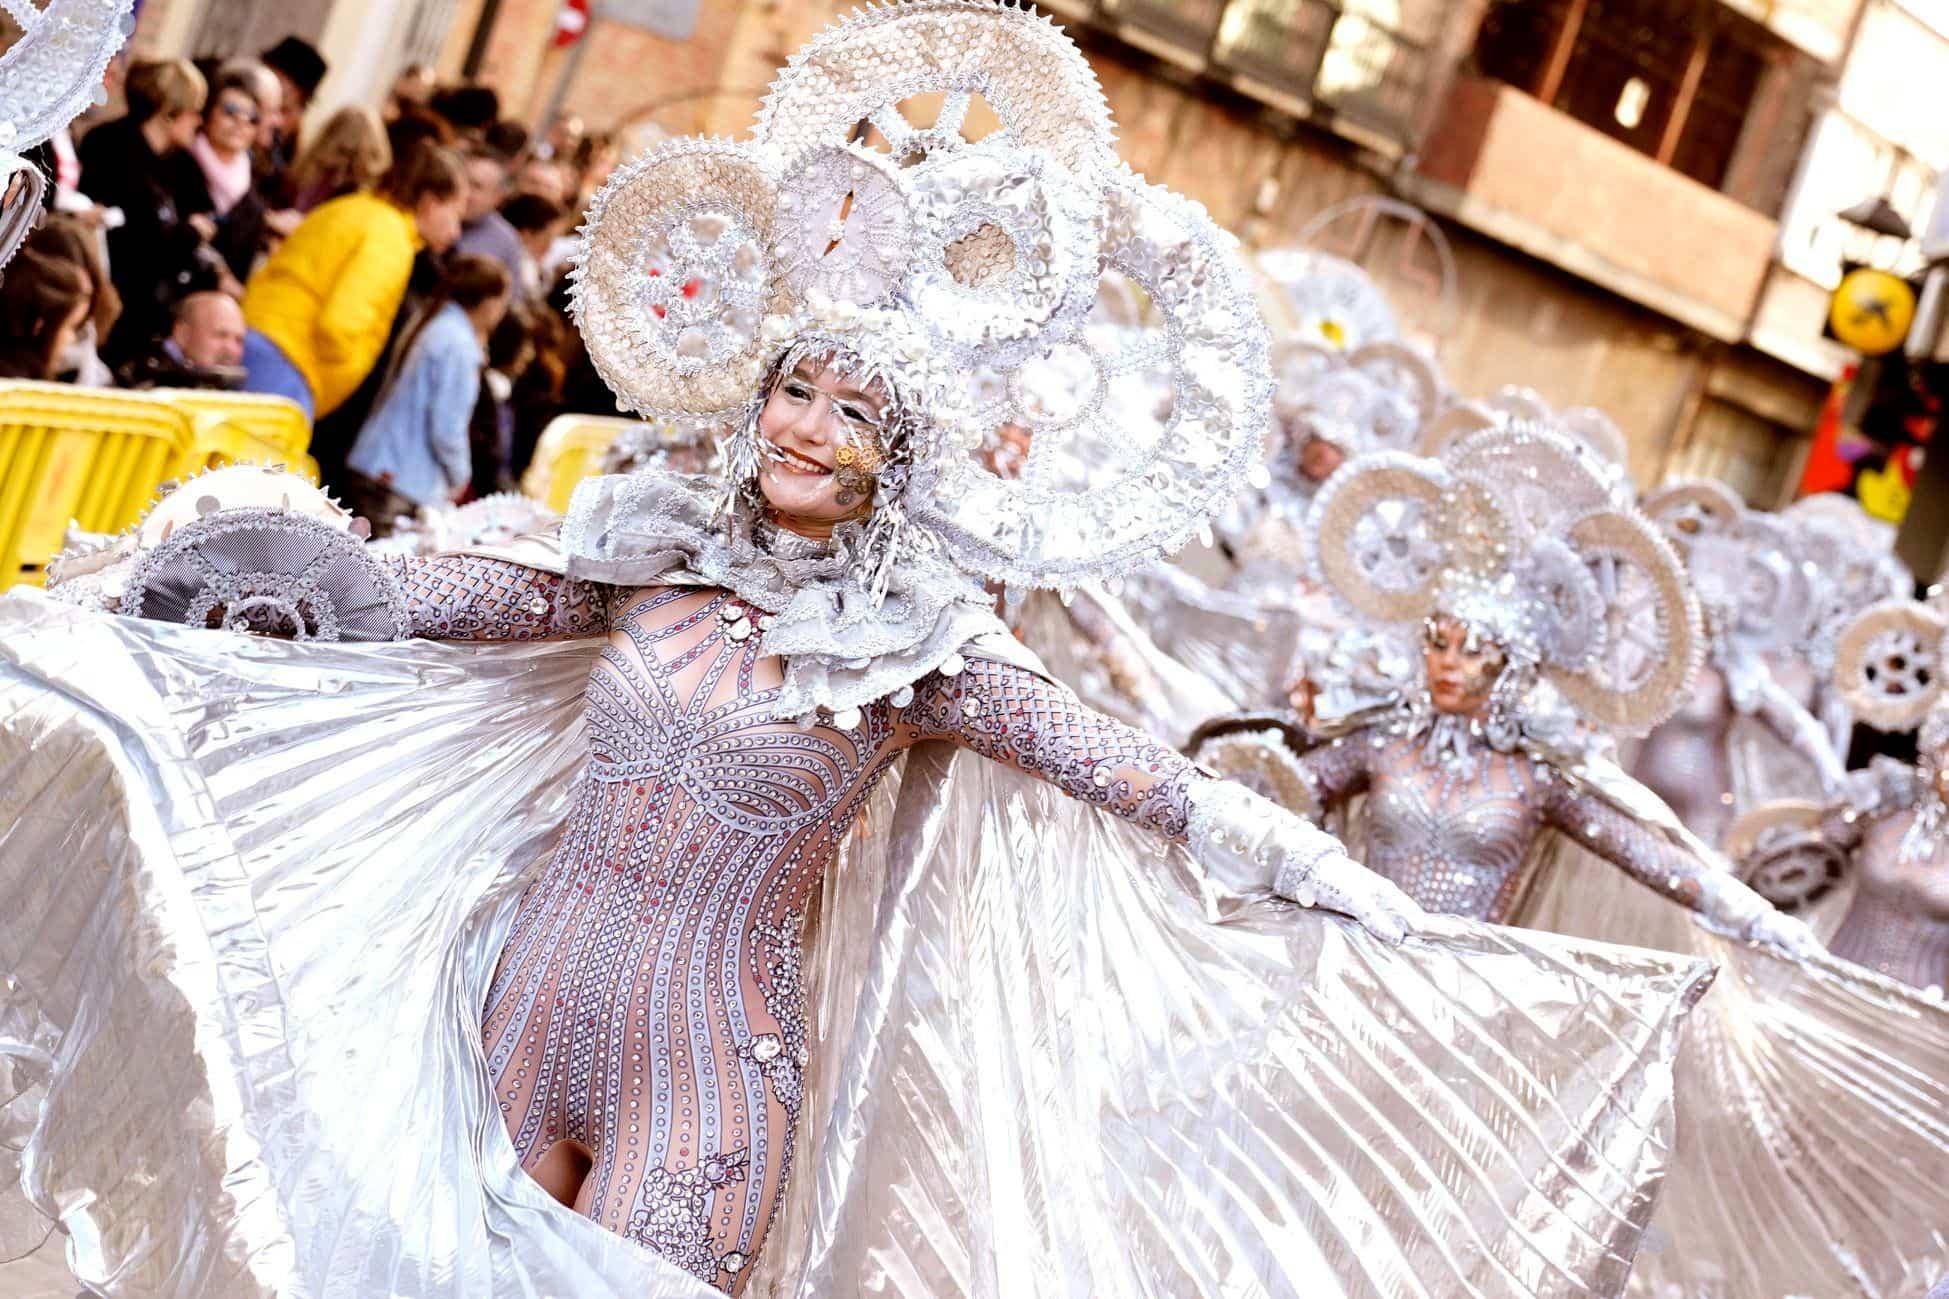 Carnaval de herencia 2020 ofertorio 25 - Selección de fotografías del Ofertorio del Carnaval de Herencia